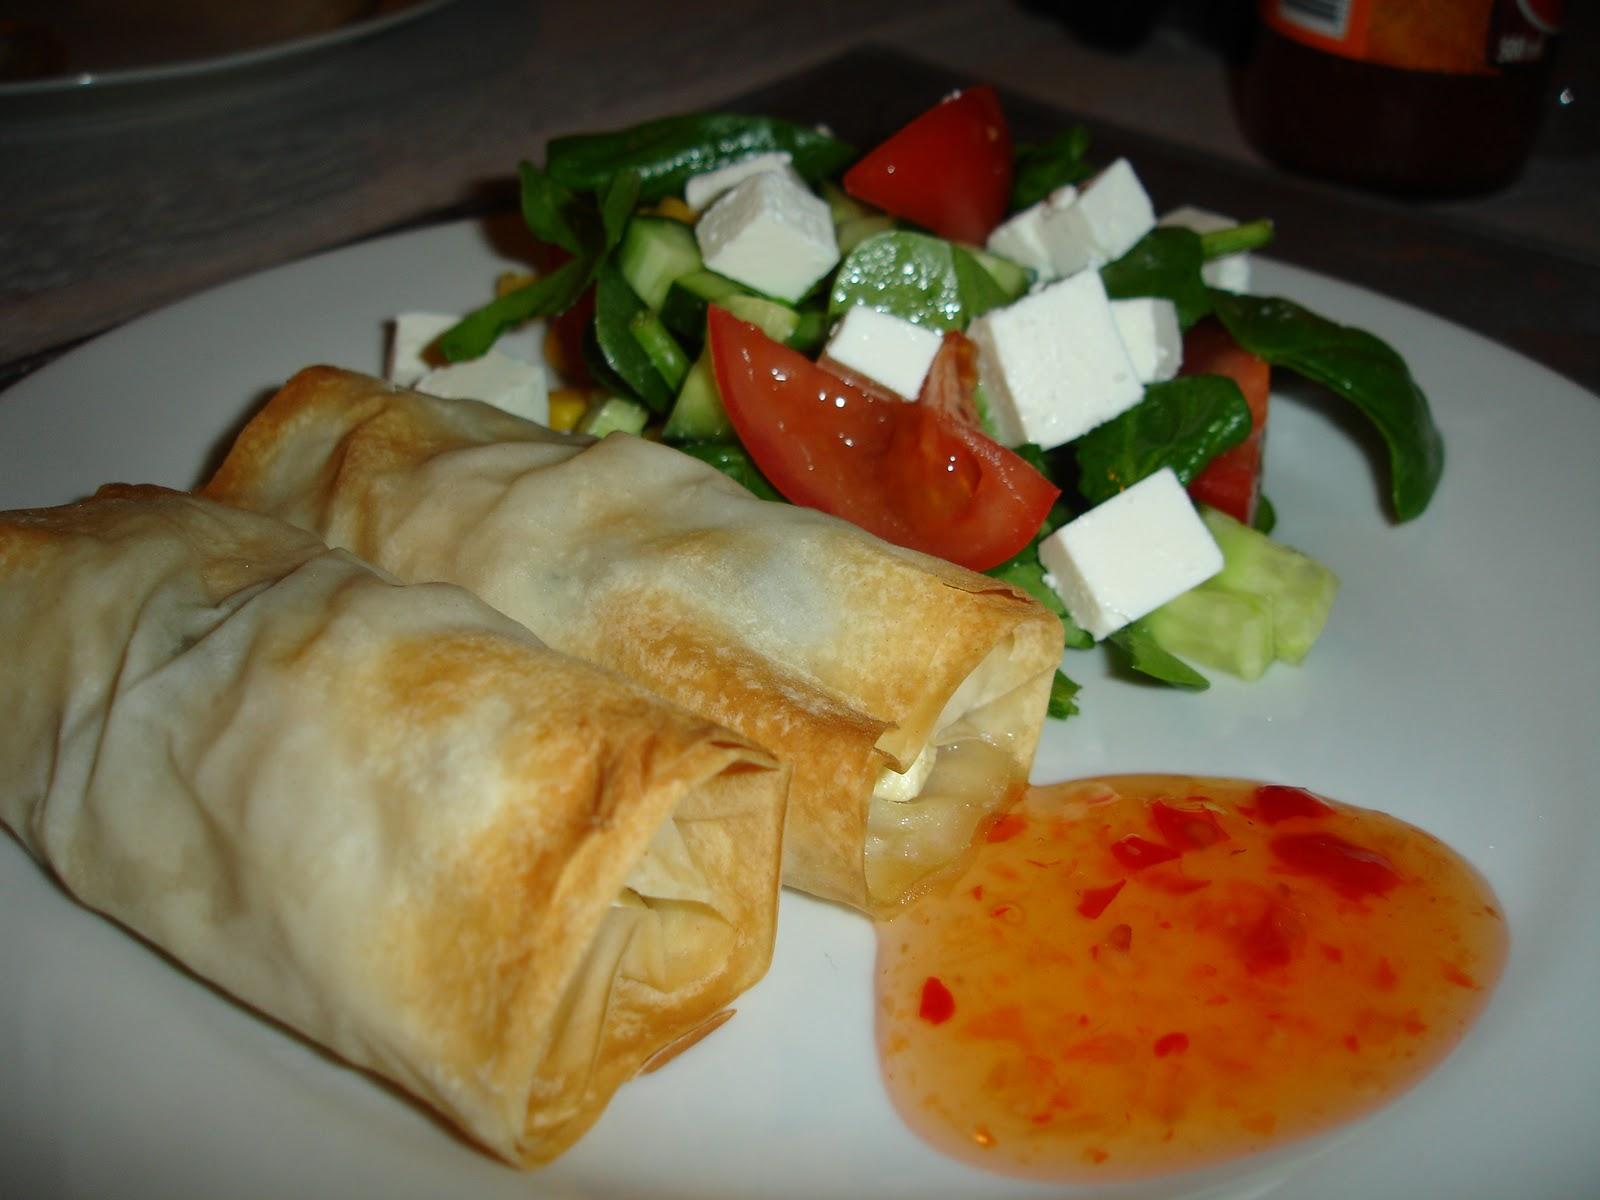 Forårsruller med kylling, spinat og feta